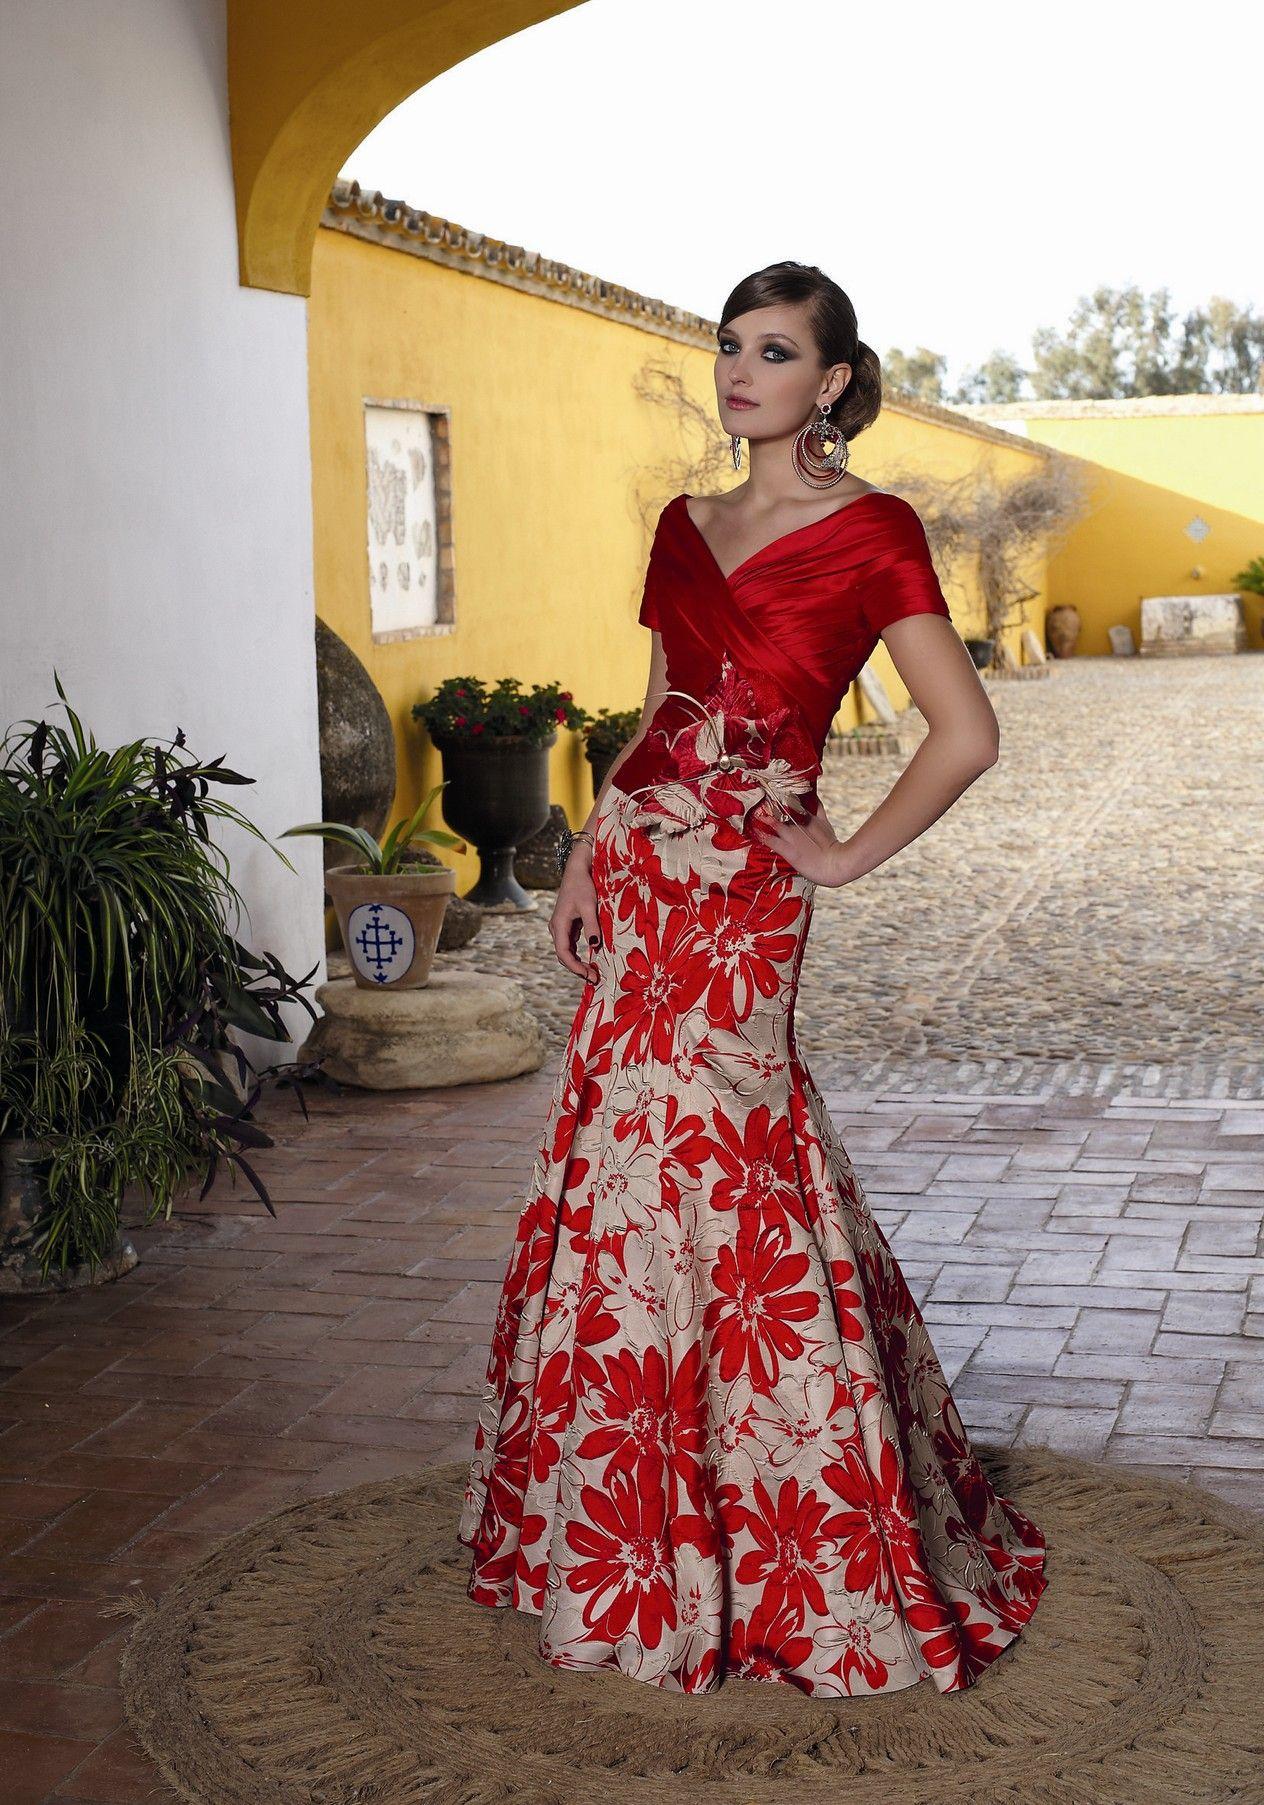 65895bba67 Vestidos de fiesta 2013 de Manu Garcia